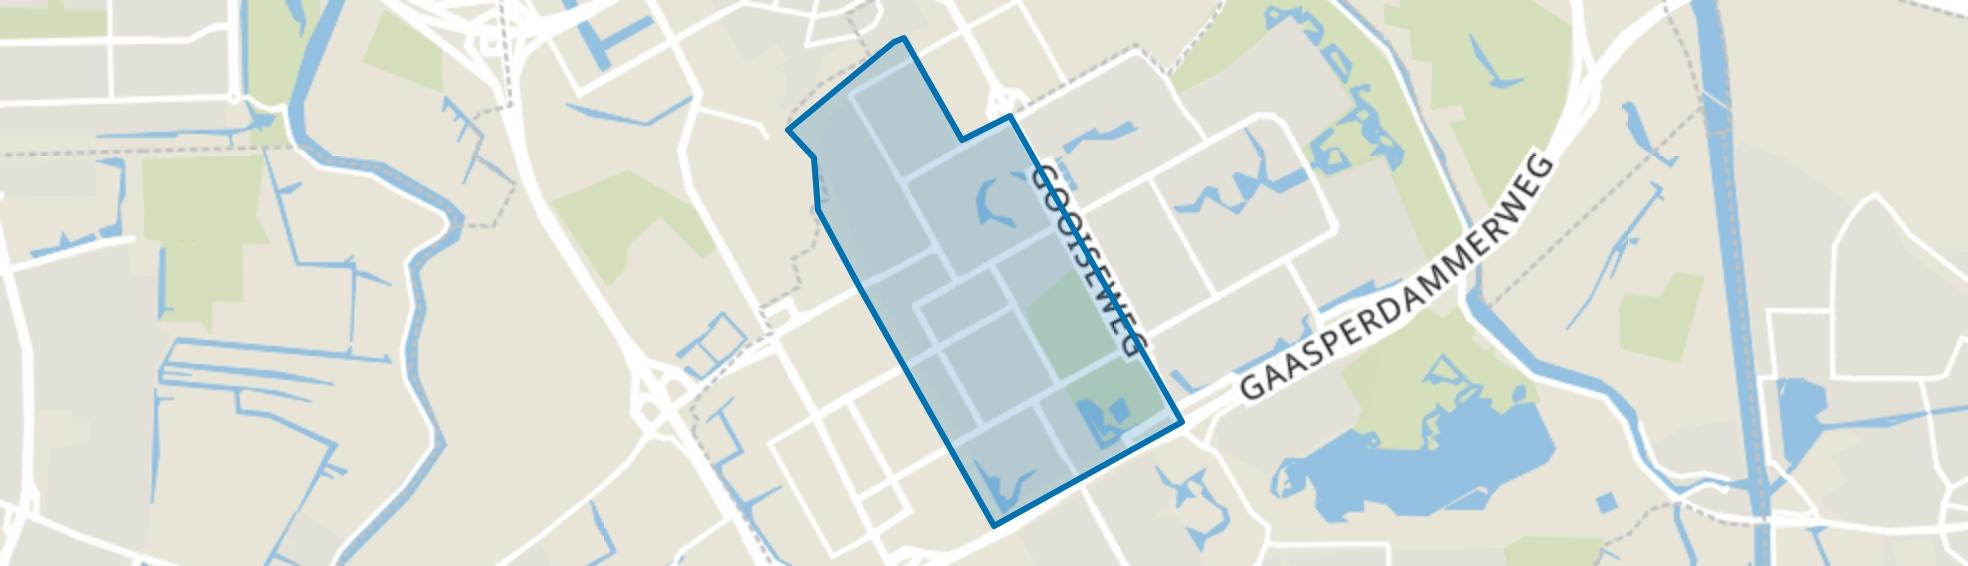 Bijlmer Centrum (D,F,H), Amsterdam map